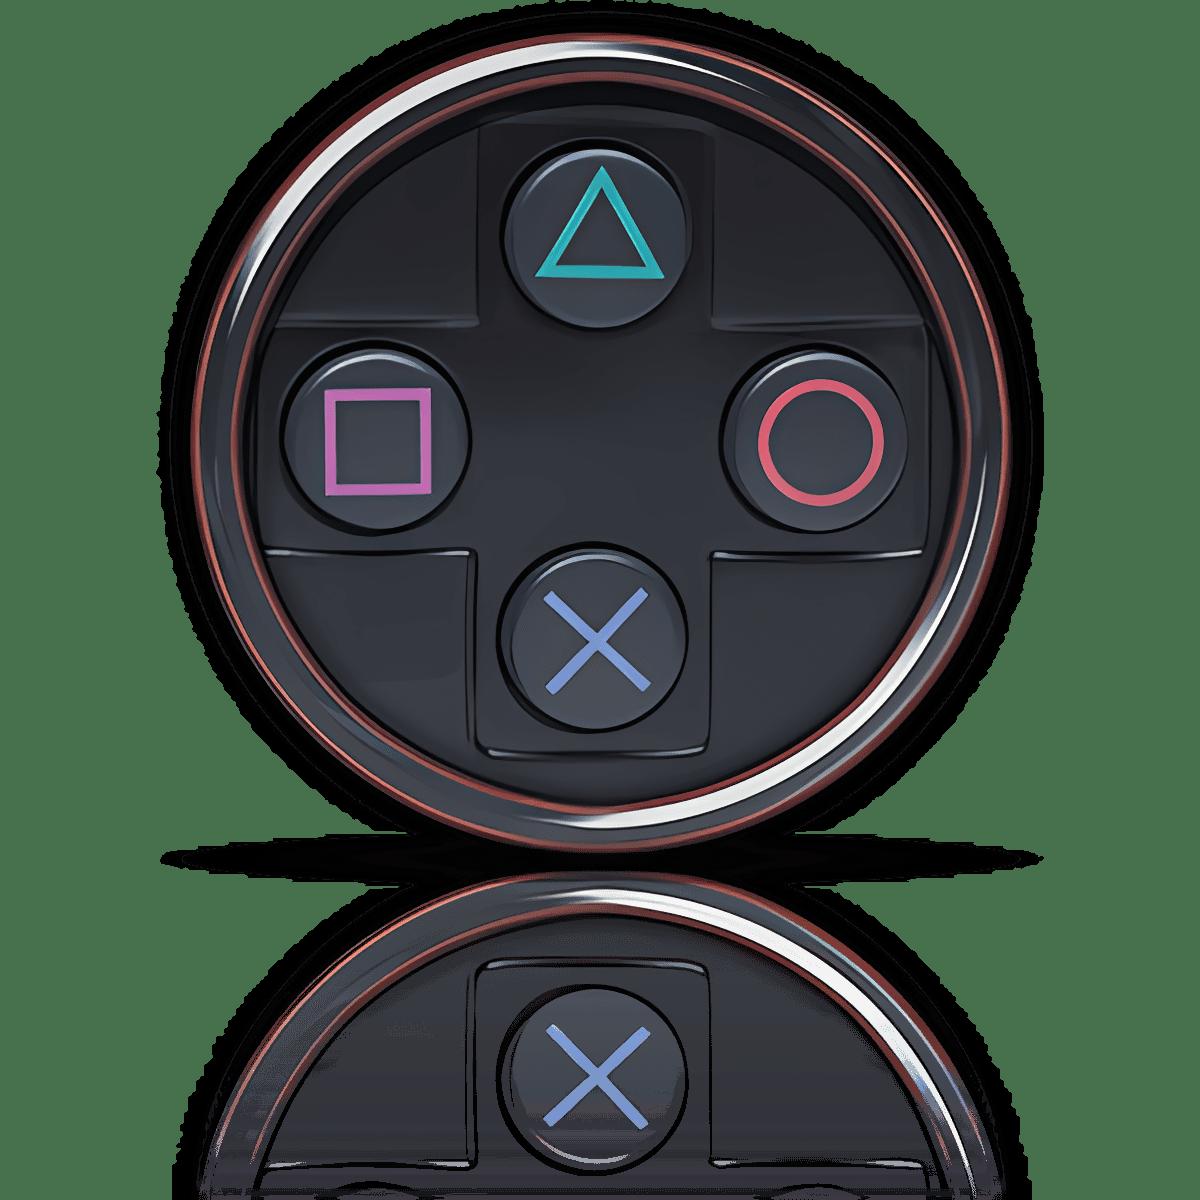 Sixaxis Controller 1.1.3